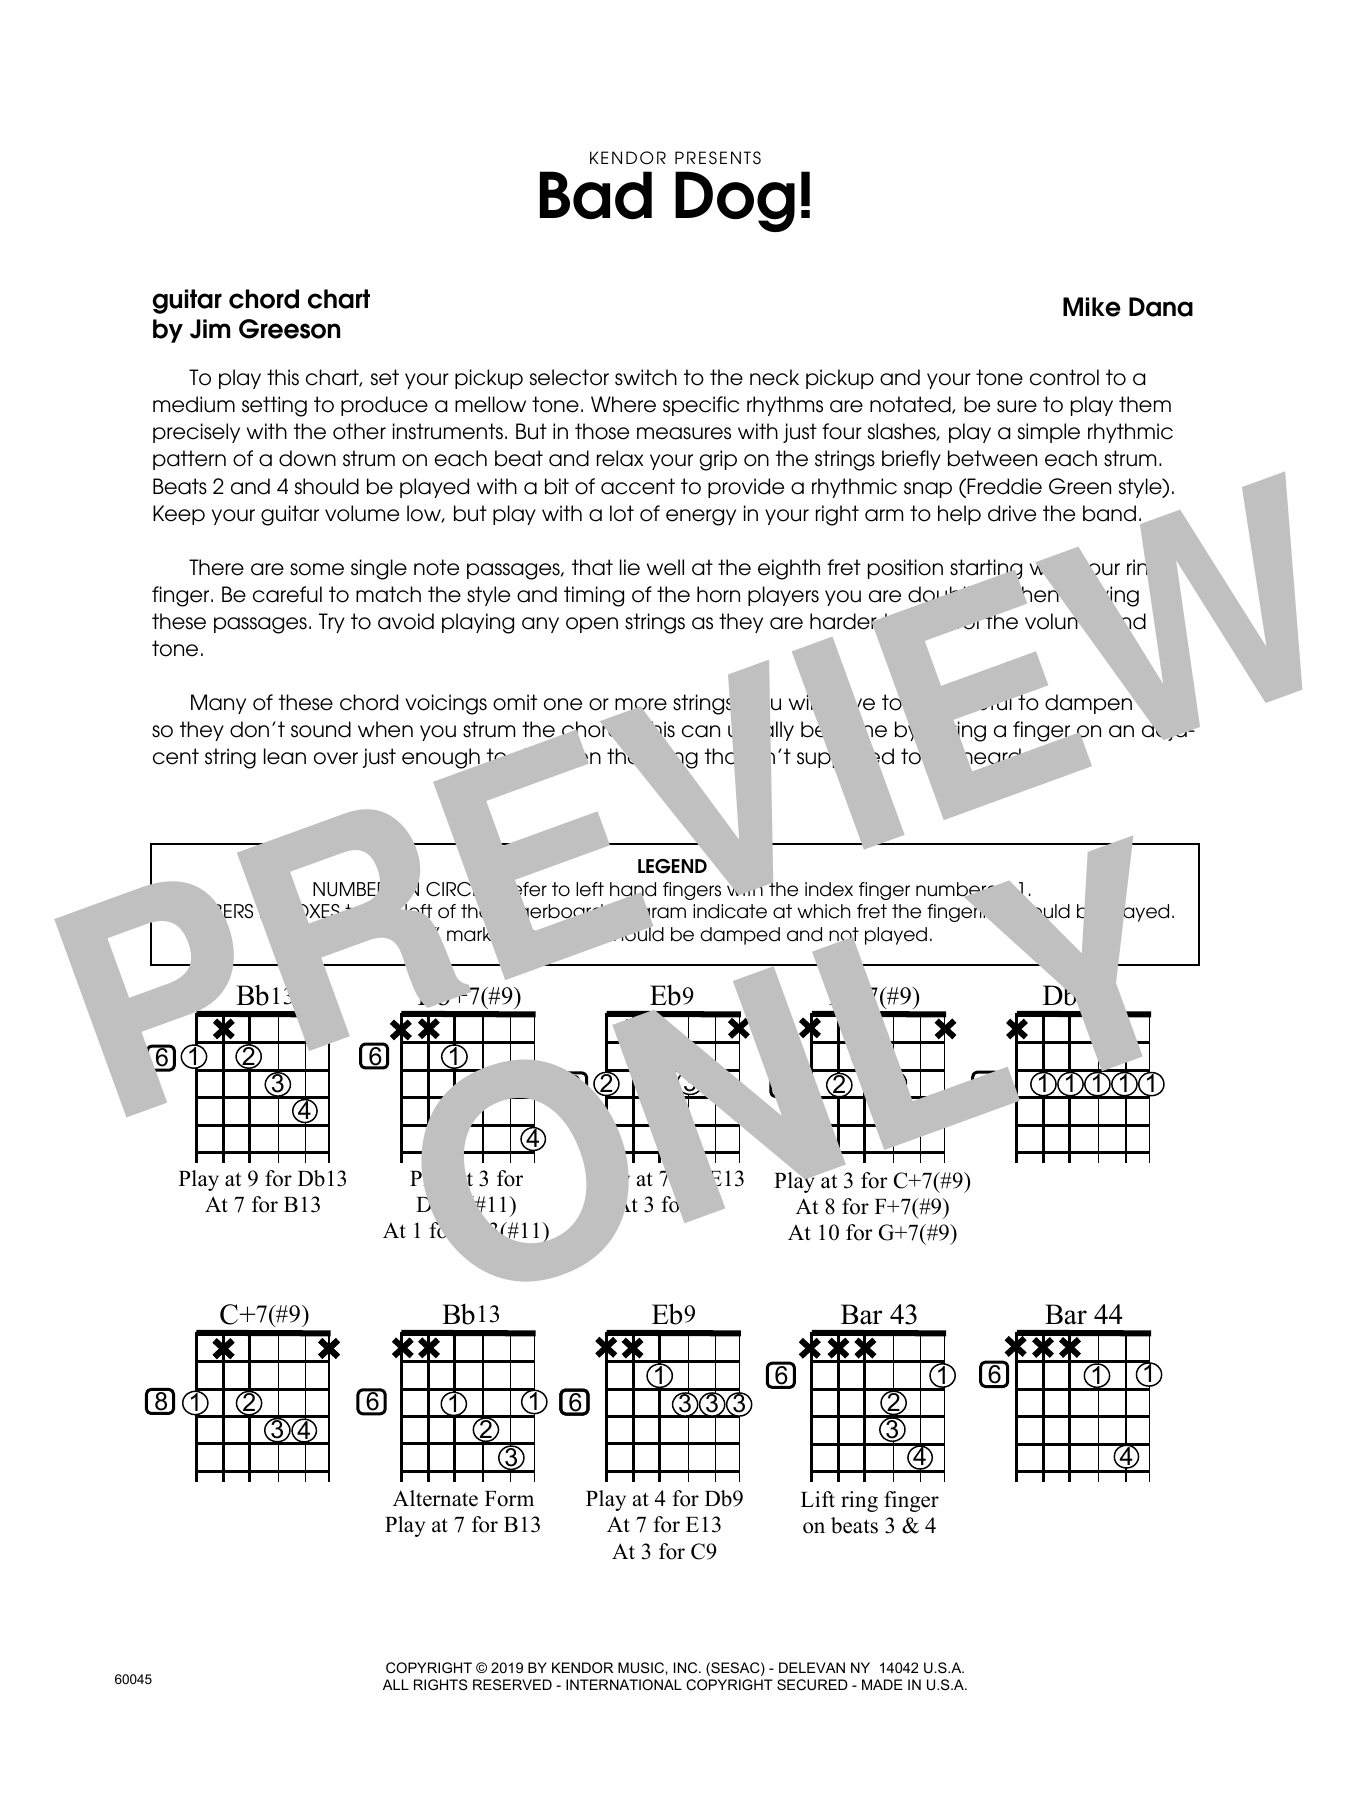 Mike Dana Bad Dog! - Guitar Chord Chart sheet music notes and chords. Download Printable PDF.